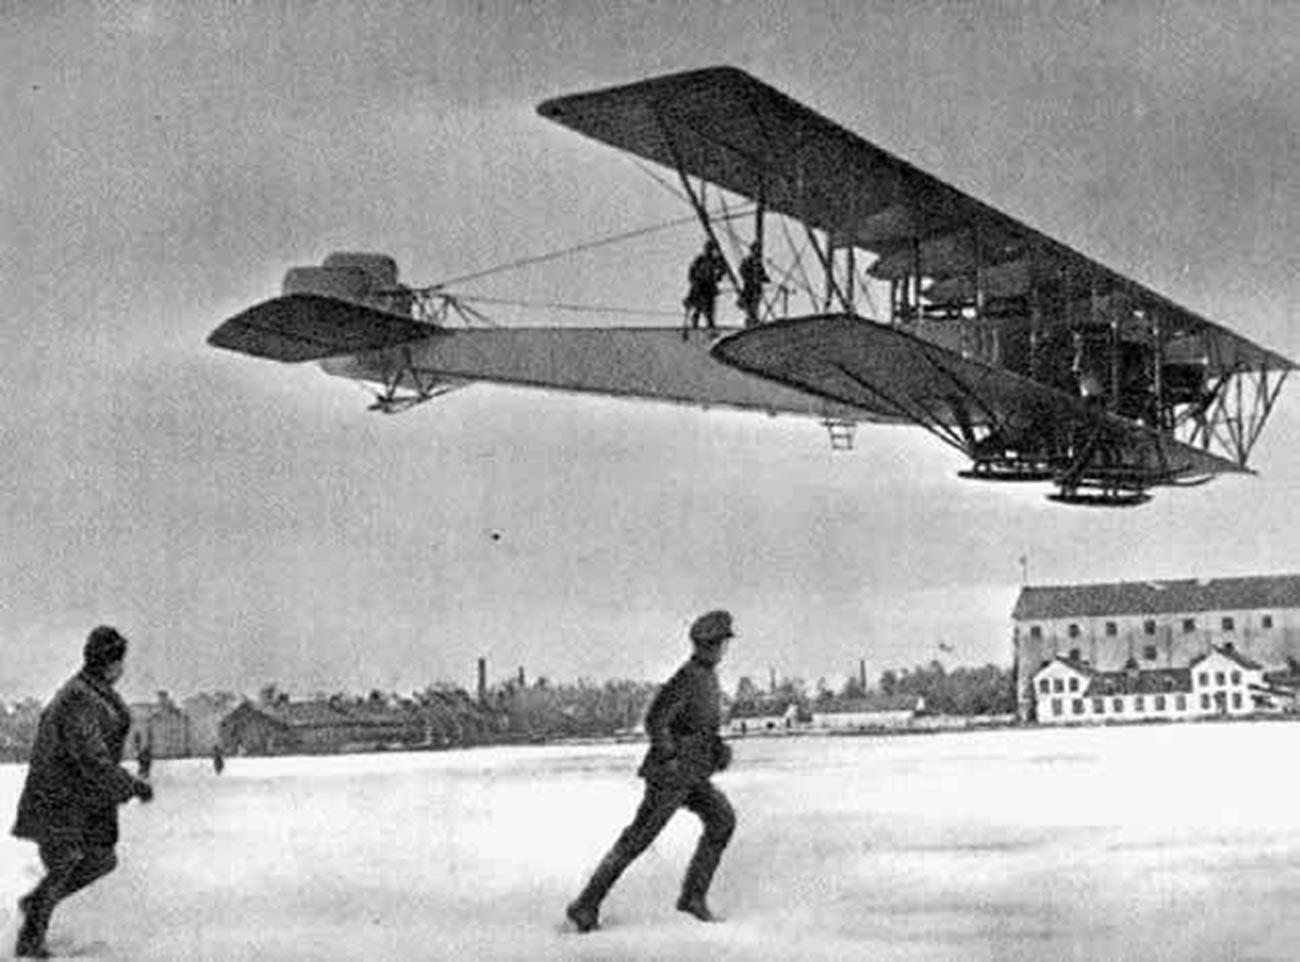 'Ilya Muromets' multi-engine bomber.